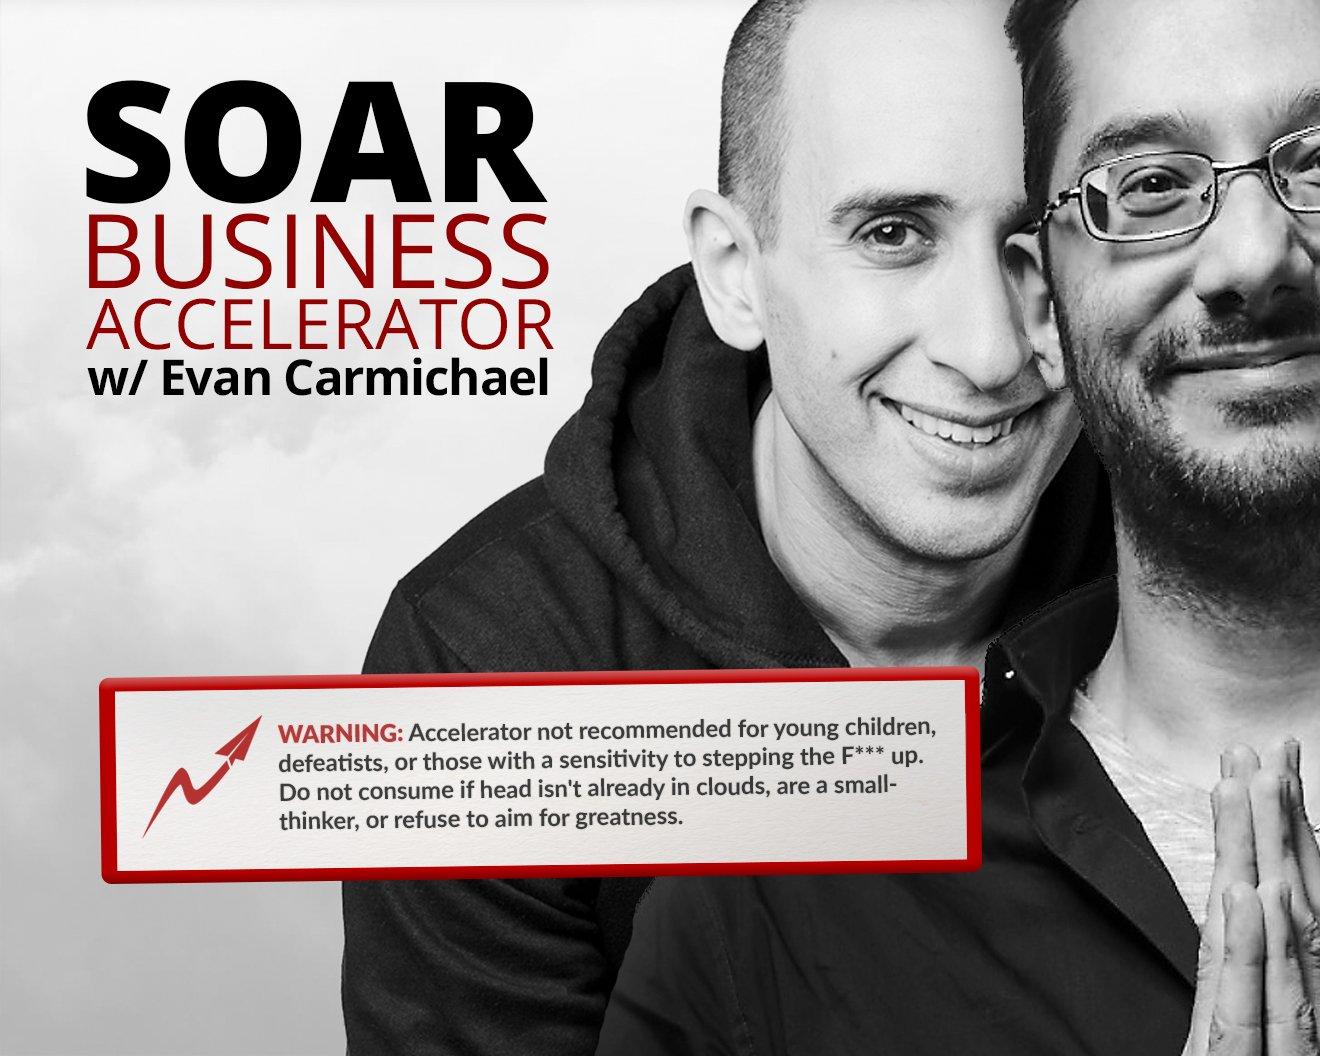 Soar Business Accelerator With Evan Carmichael